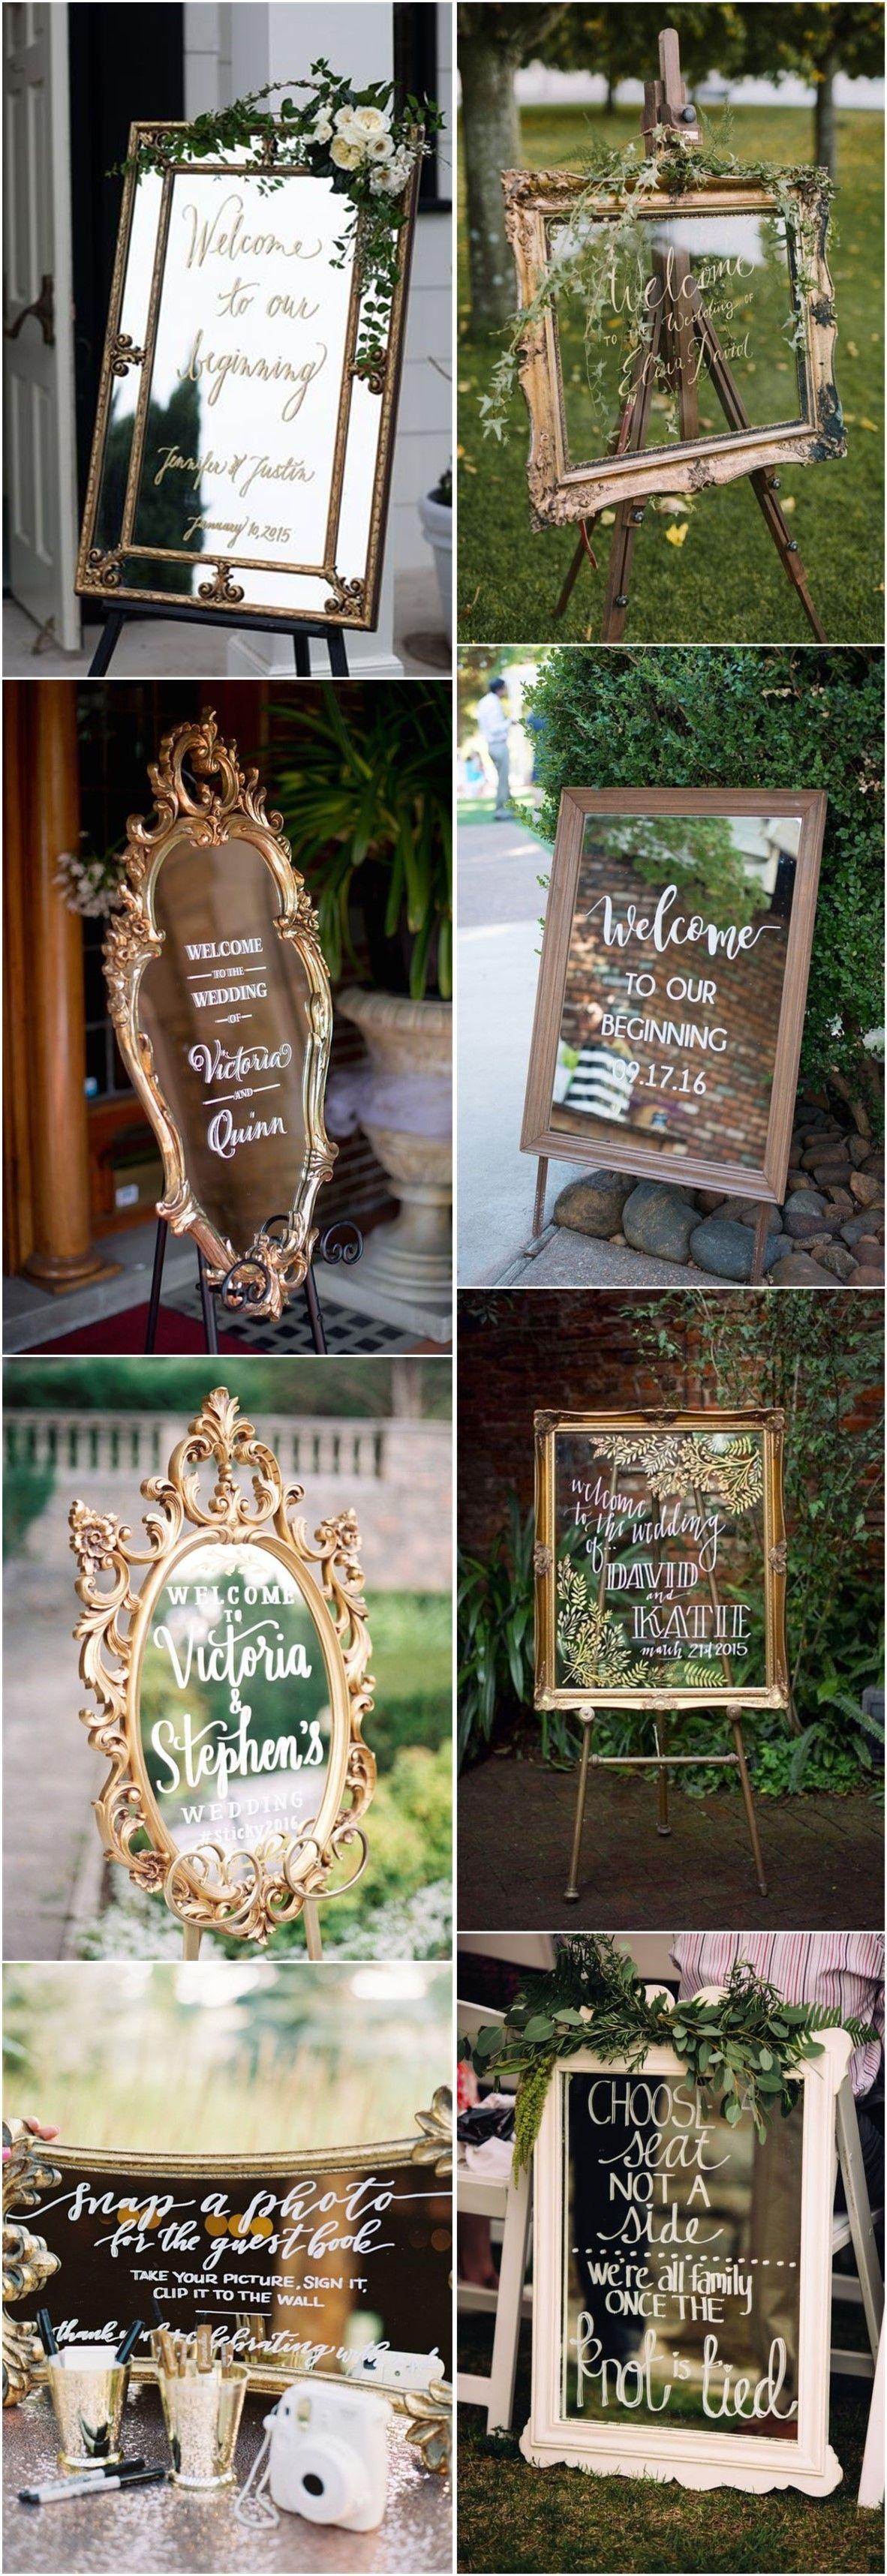 Wedding Decorations » 27 Vintage Mirror Wedding Sign Decoration Ideas » ️ See more: